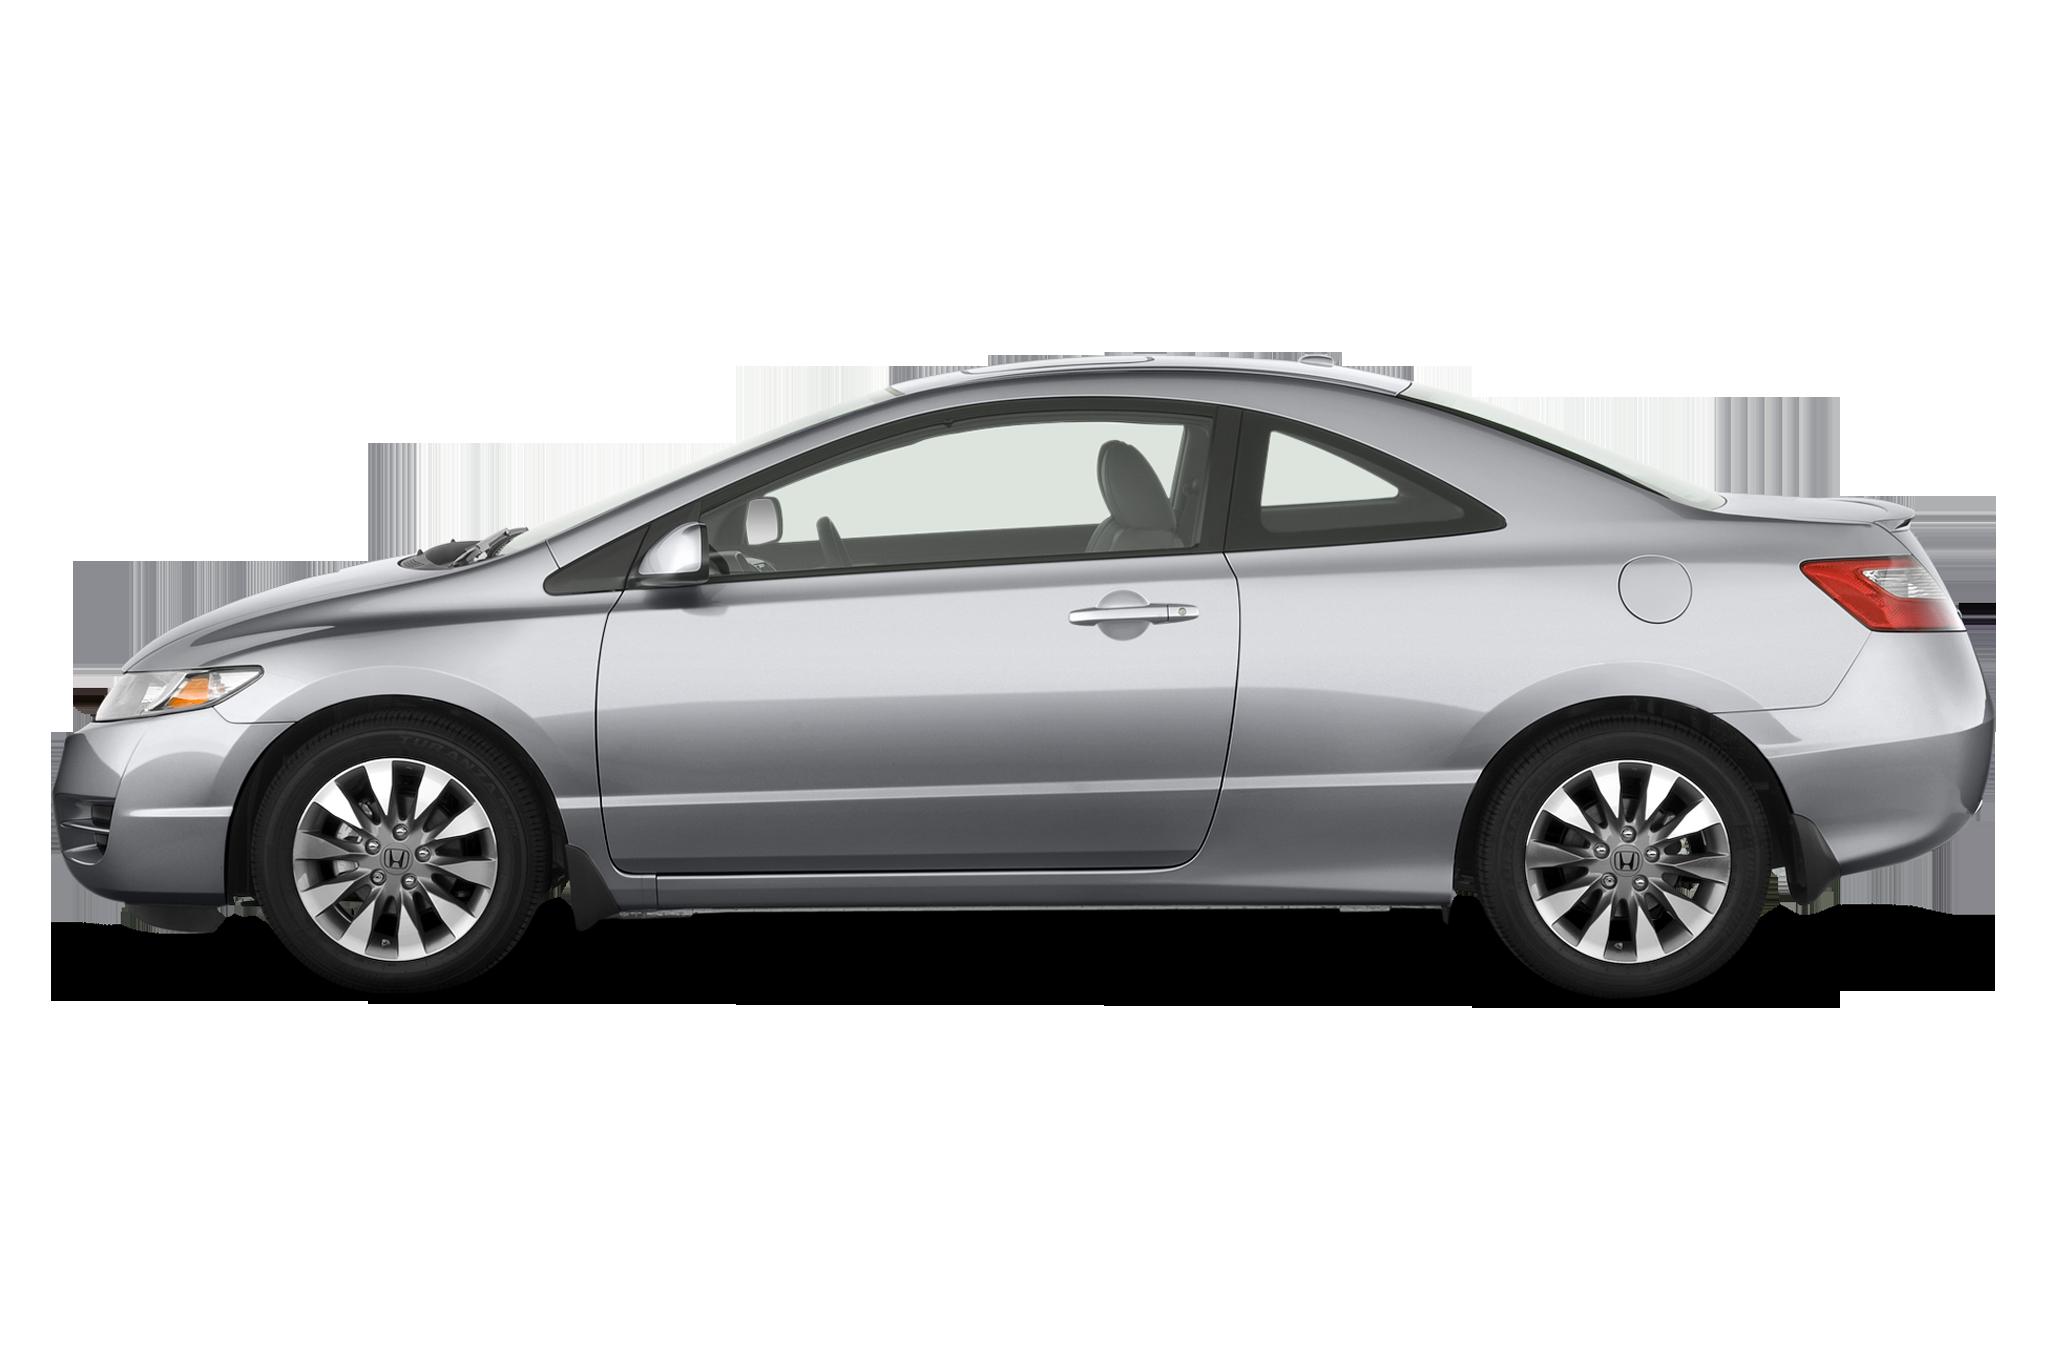 Honda Civic Si Coupe 2018 >> 2010 Honda Civic Si Coupe - Automobile Magazine